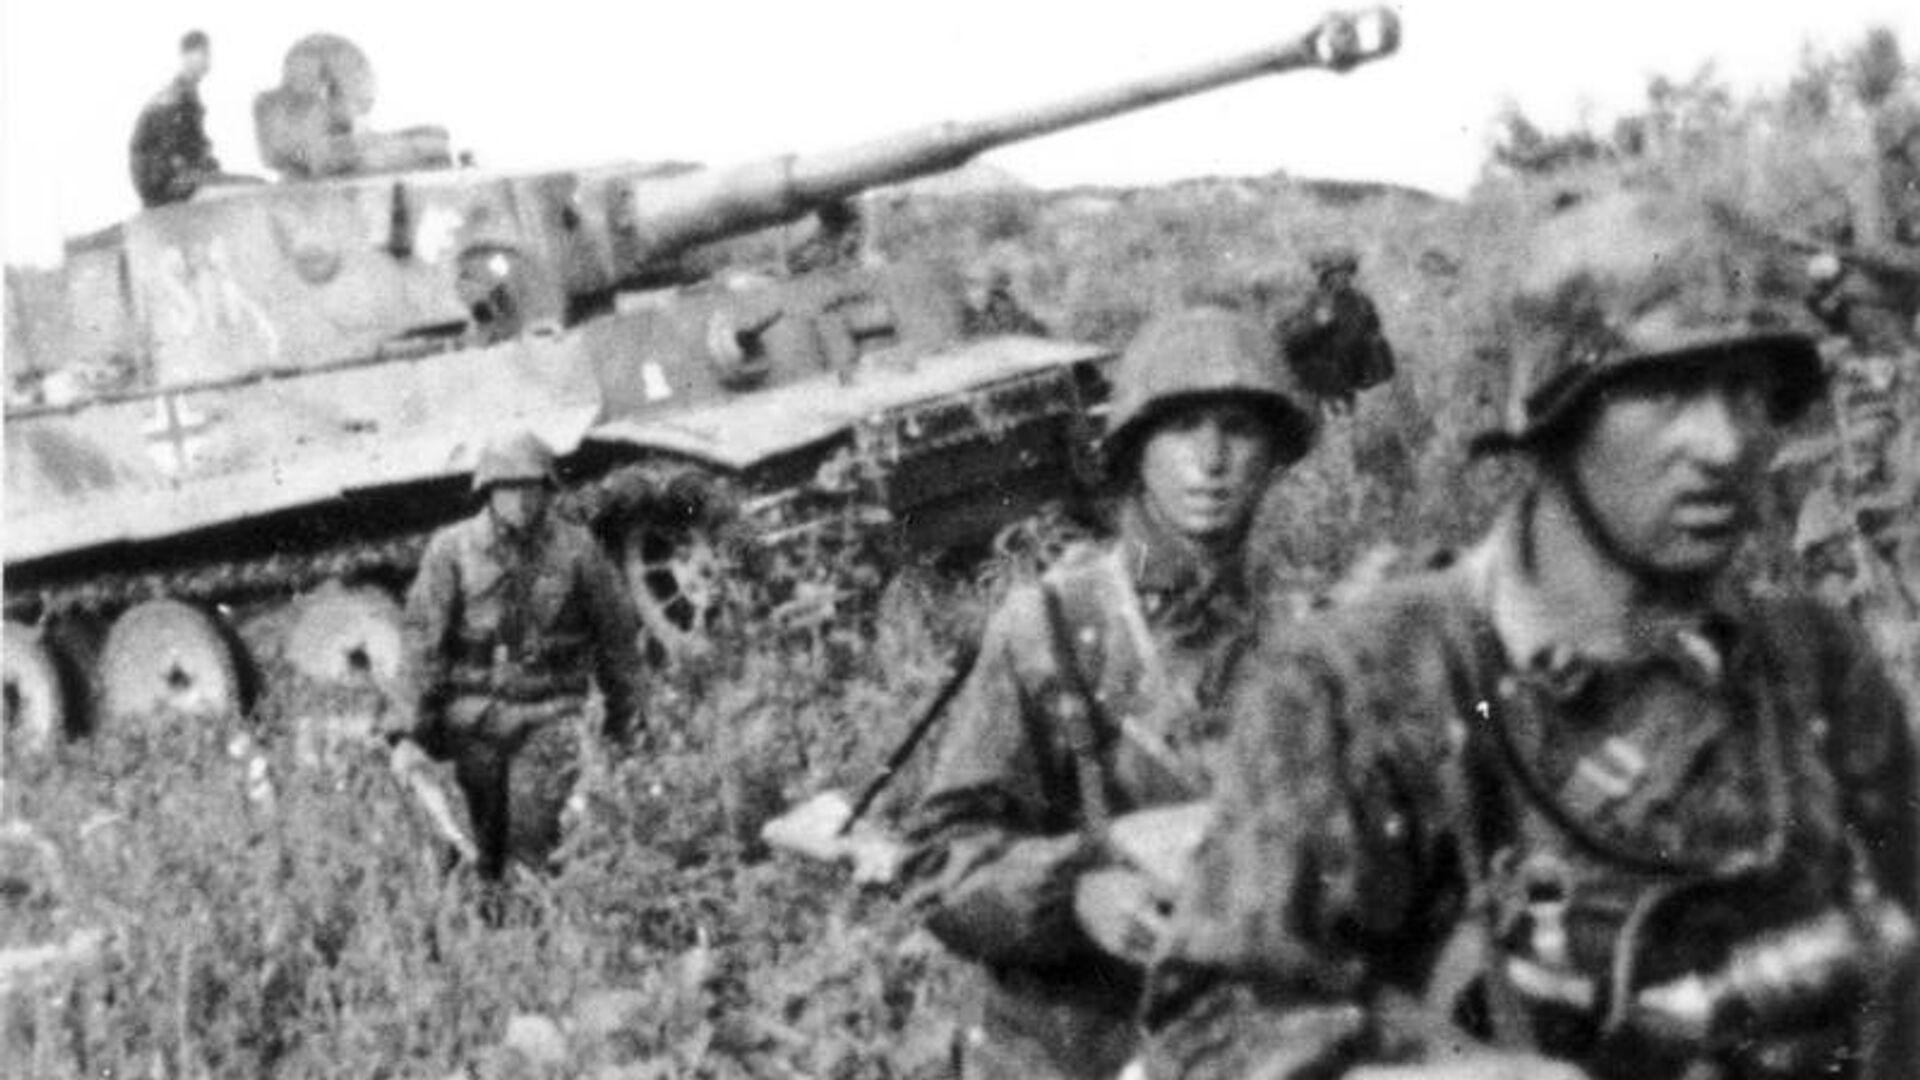 Waffen SS Division Das Reich units with a Tiger I tank. Kursk, 1943.  - Sputnik International, 1920, 23.09.2021